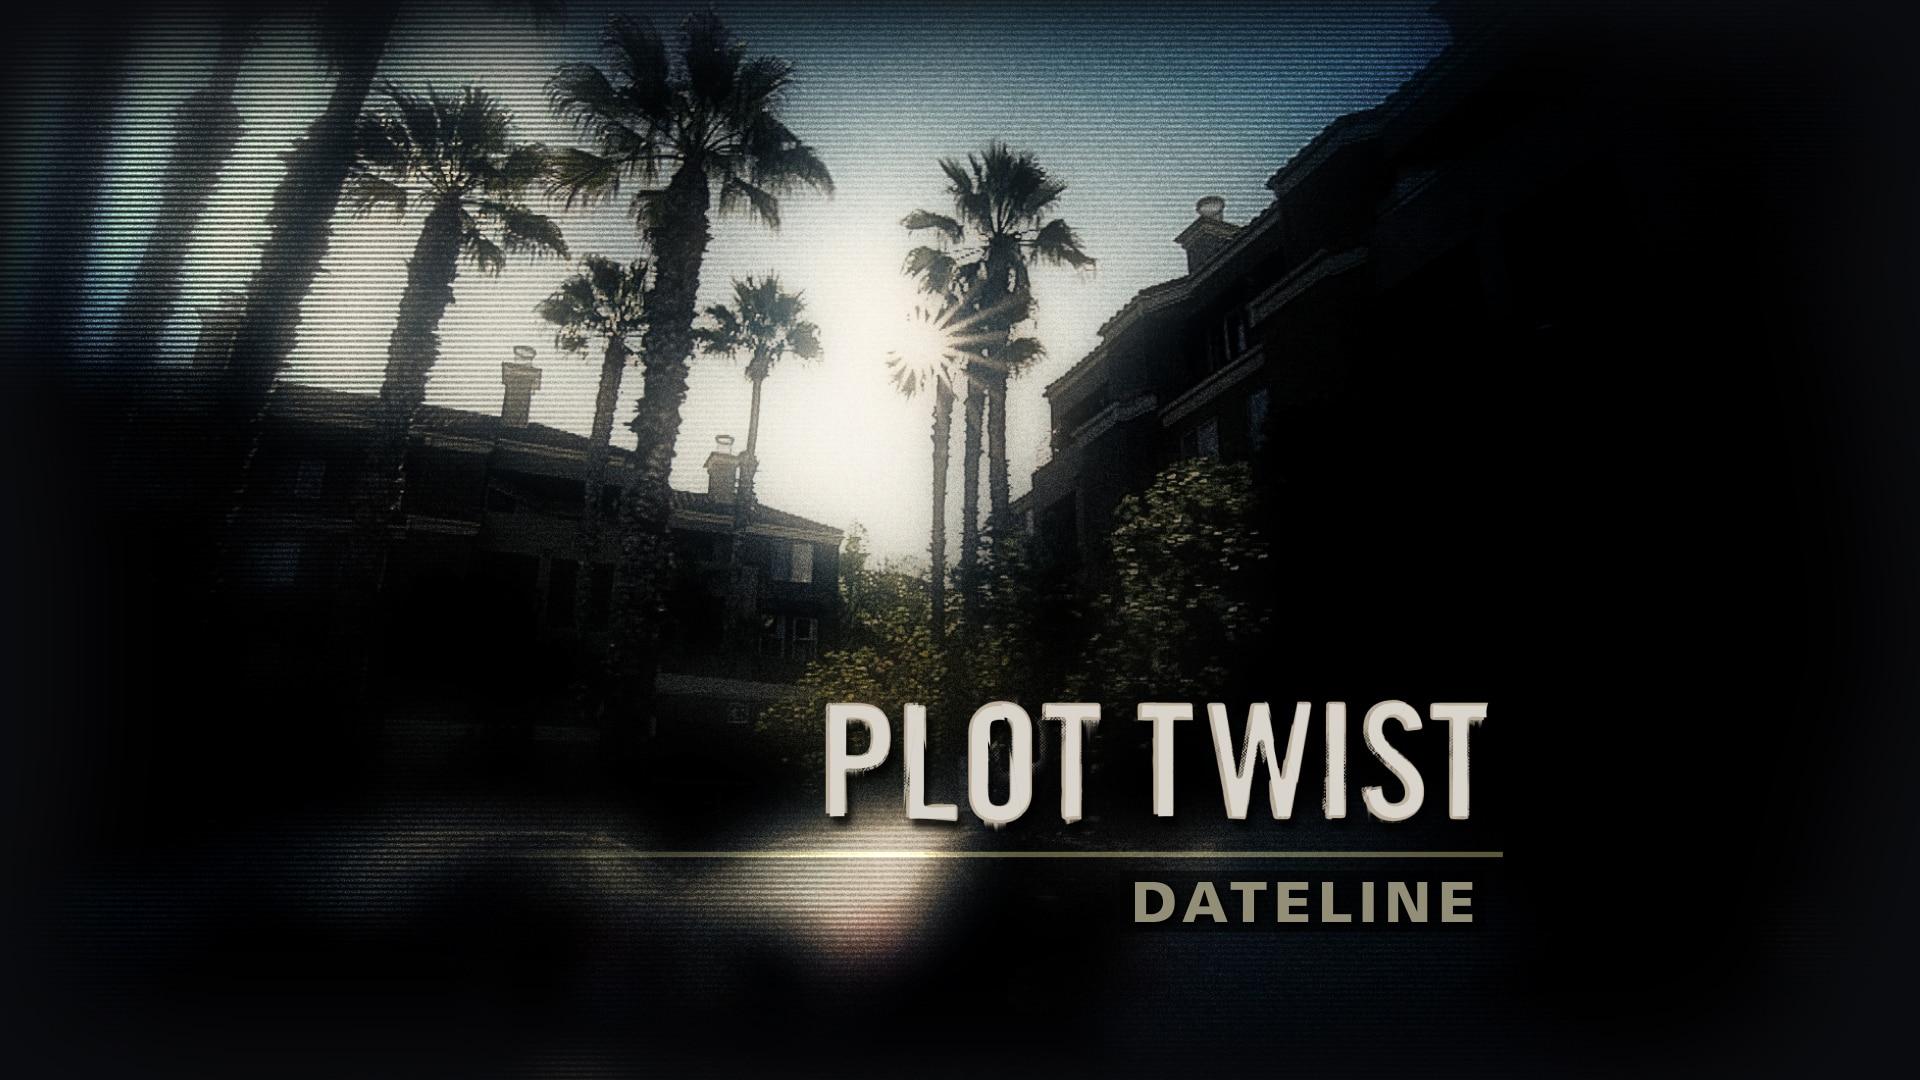 Watch Dateline Episode: Dateline 01-15 - NBC.com